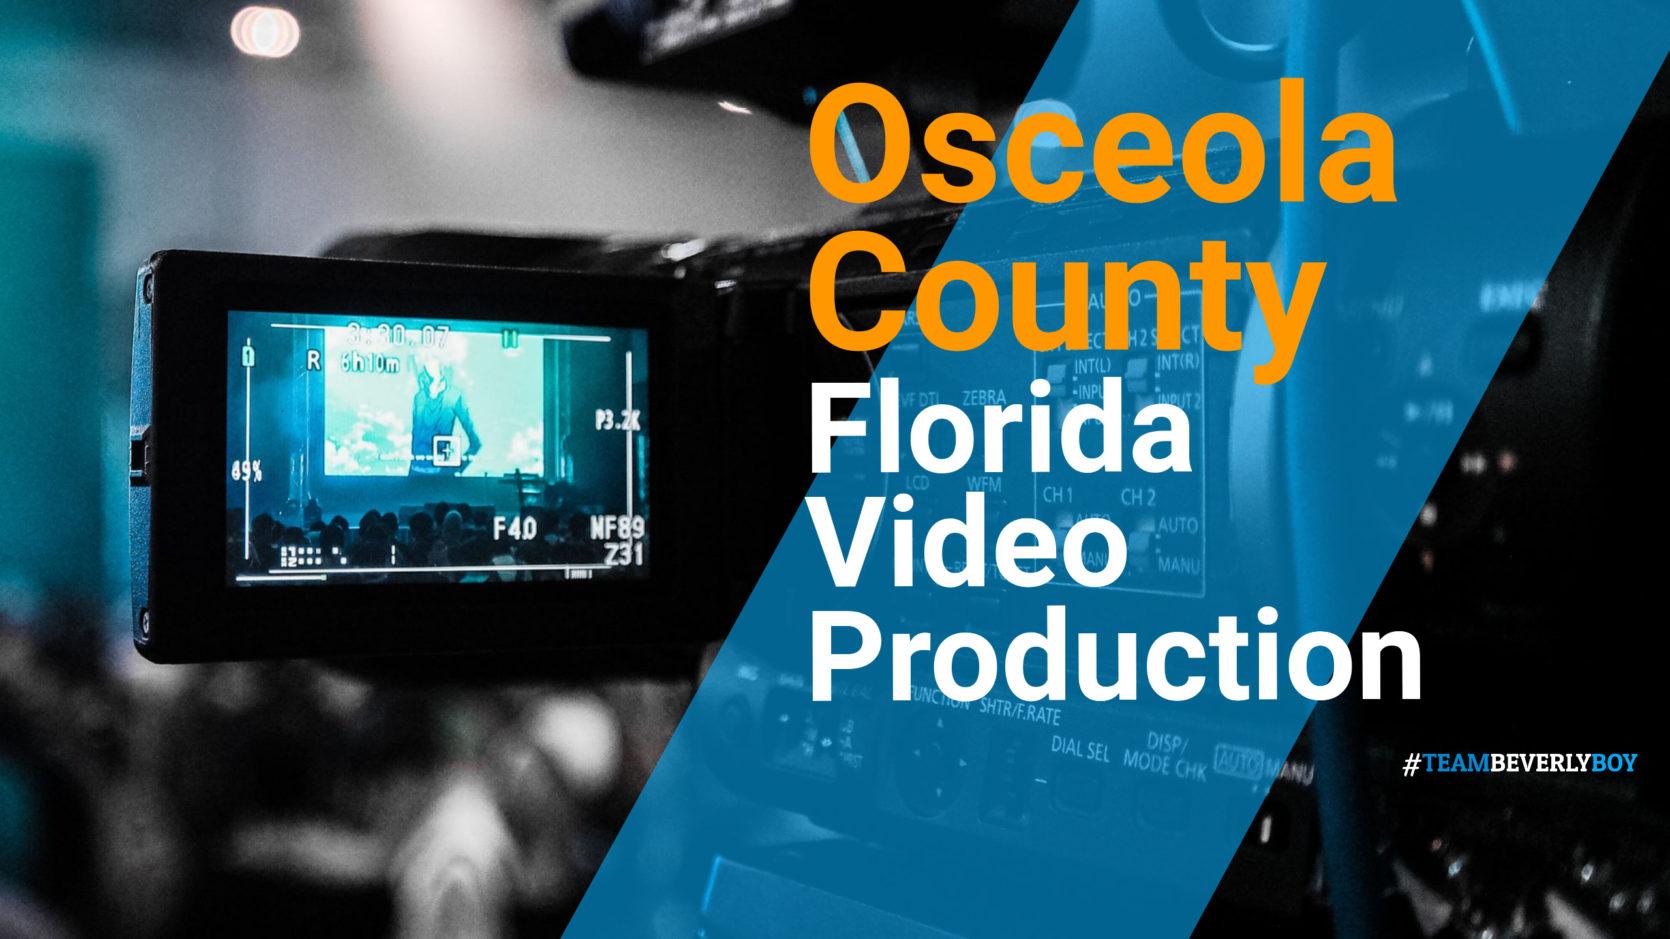 Osceola County, FL Video Production